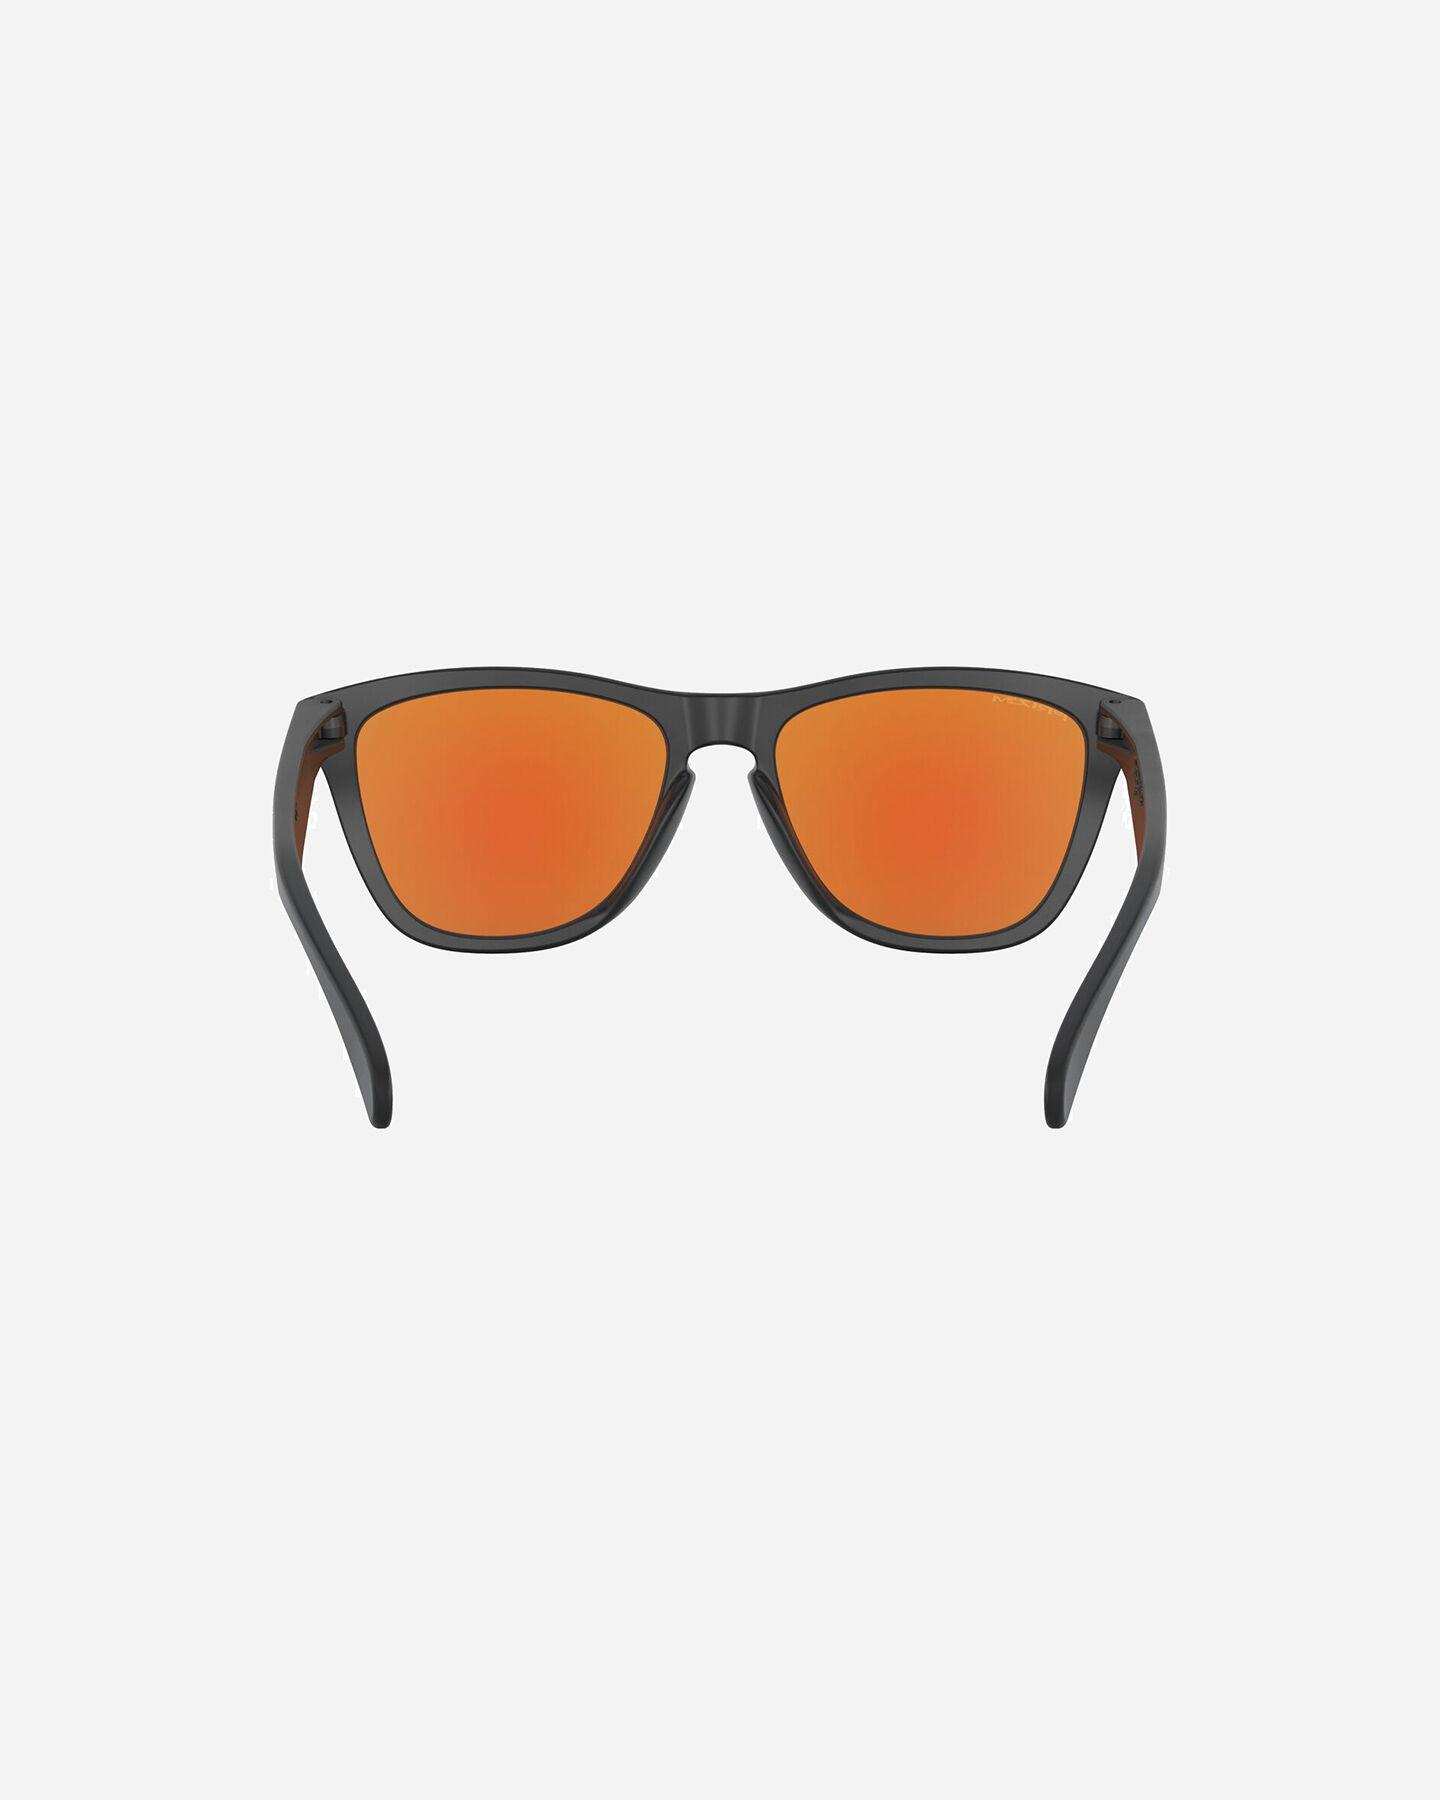 Occhiali OAKLEY FROGSKIN S5221212|H655|55 scatto 3